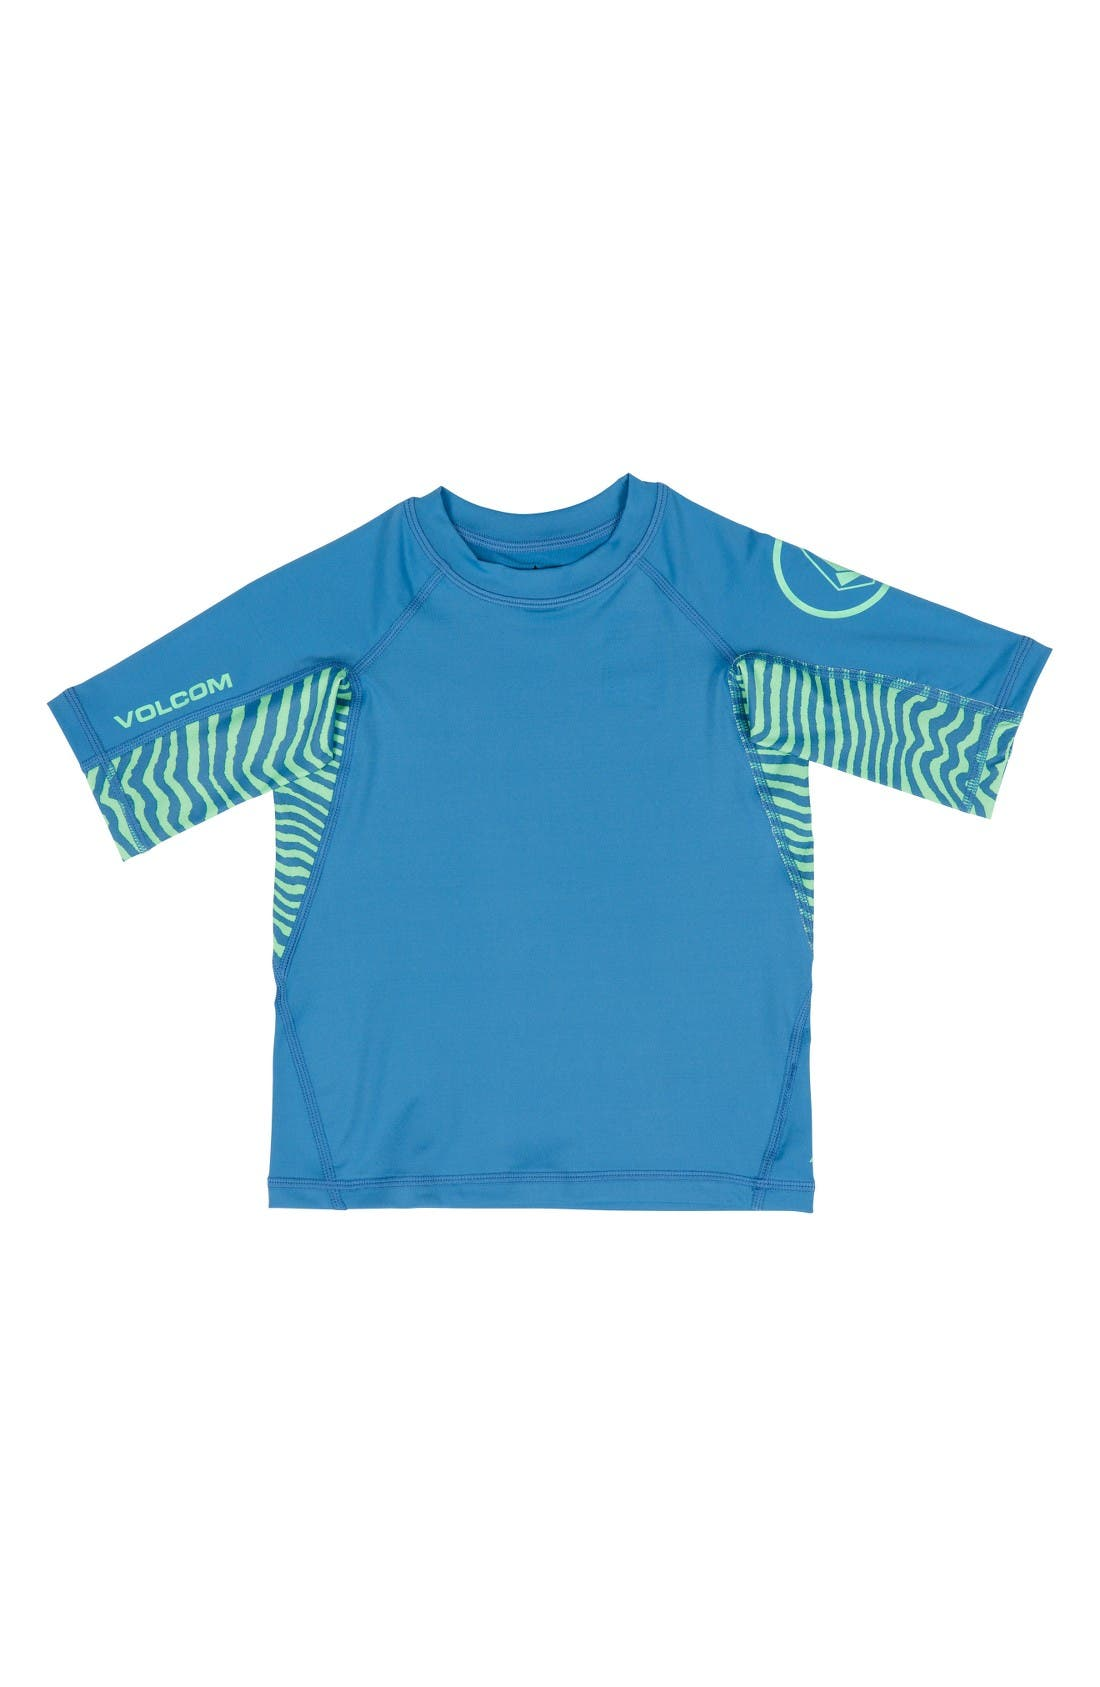 Volcom Vibes Short Sleeve Rashguard (Toddler Boys & Little Boys)